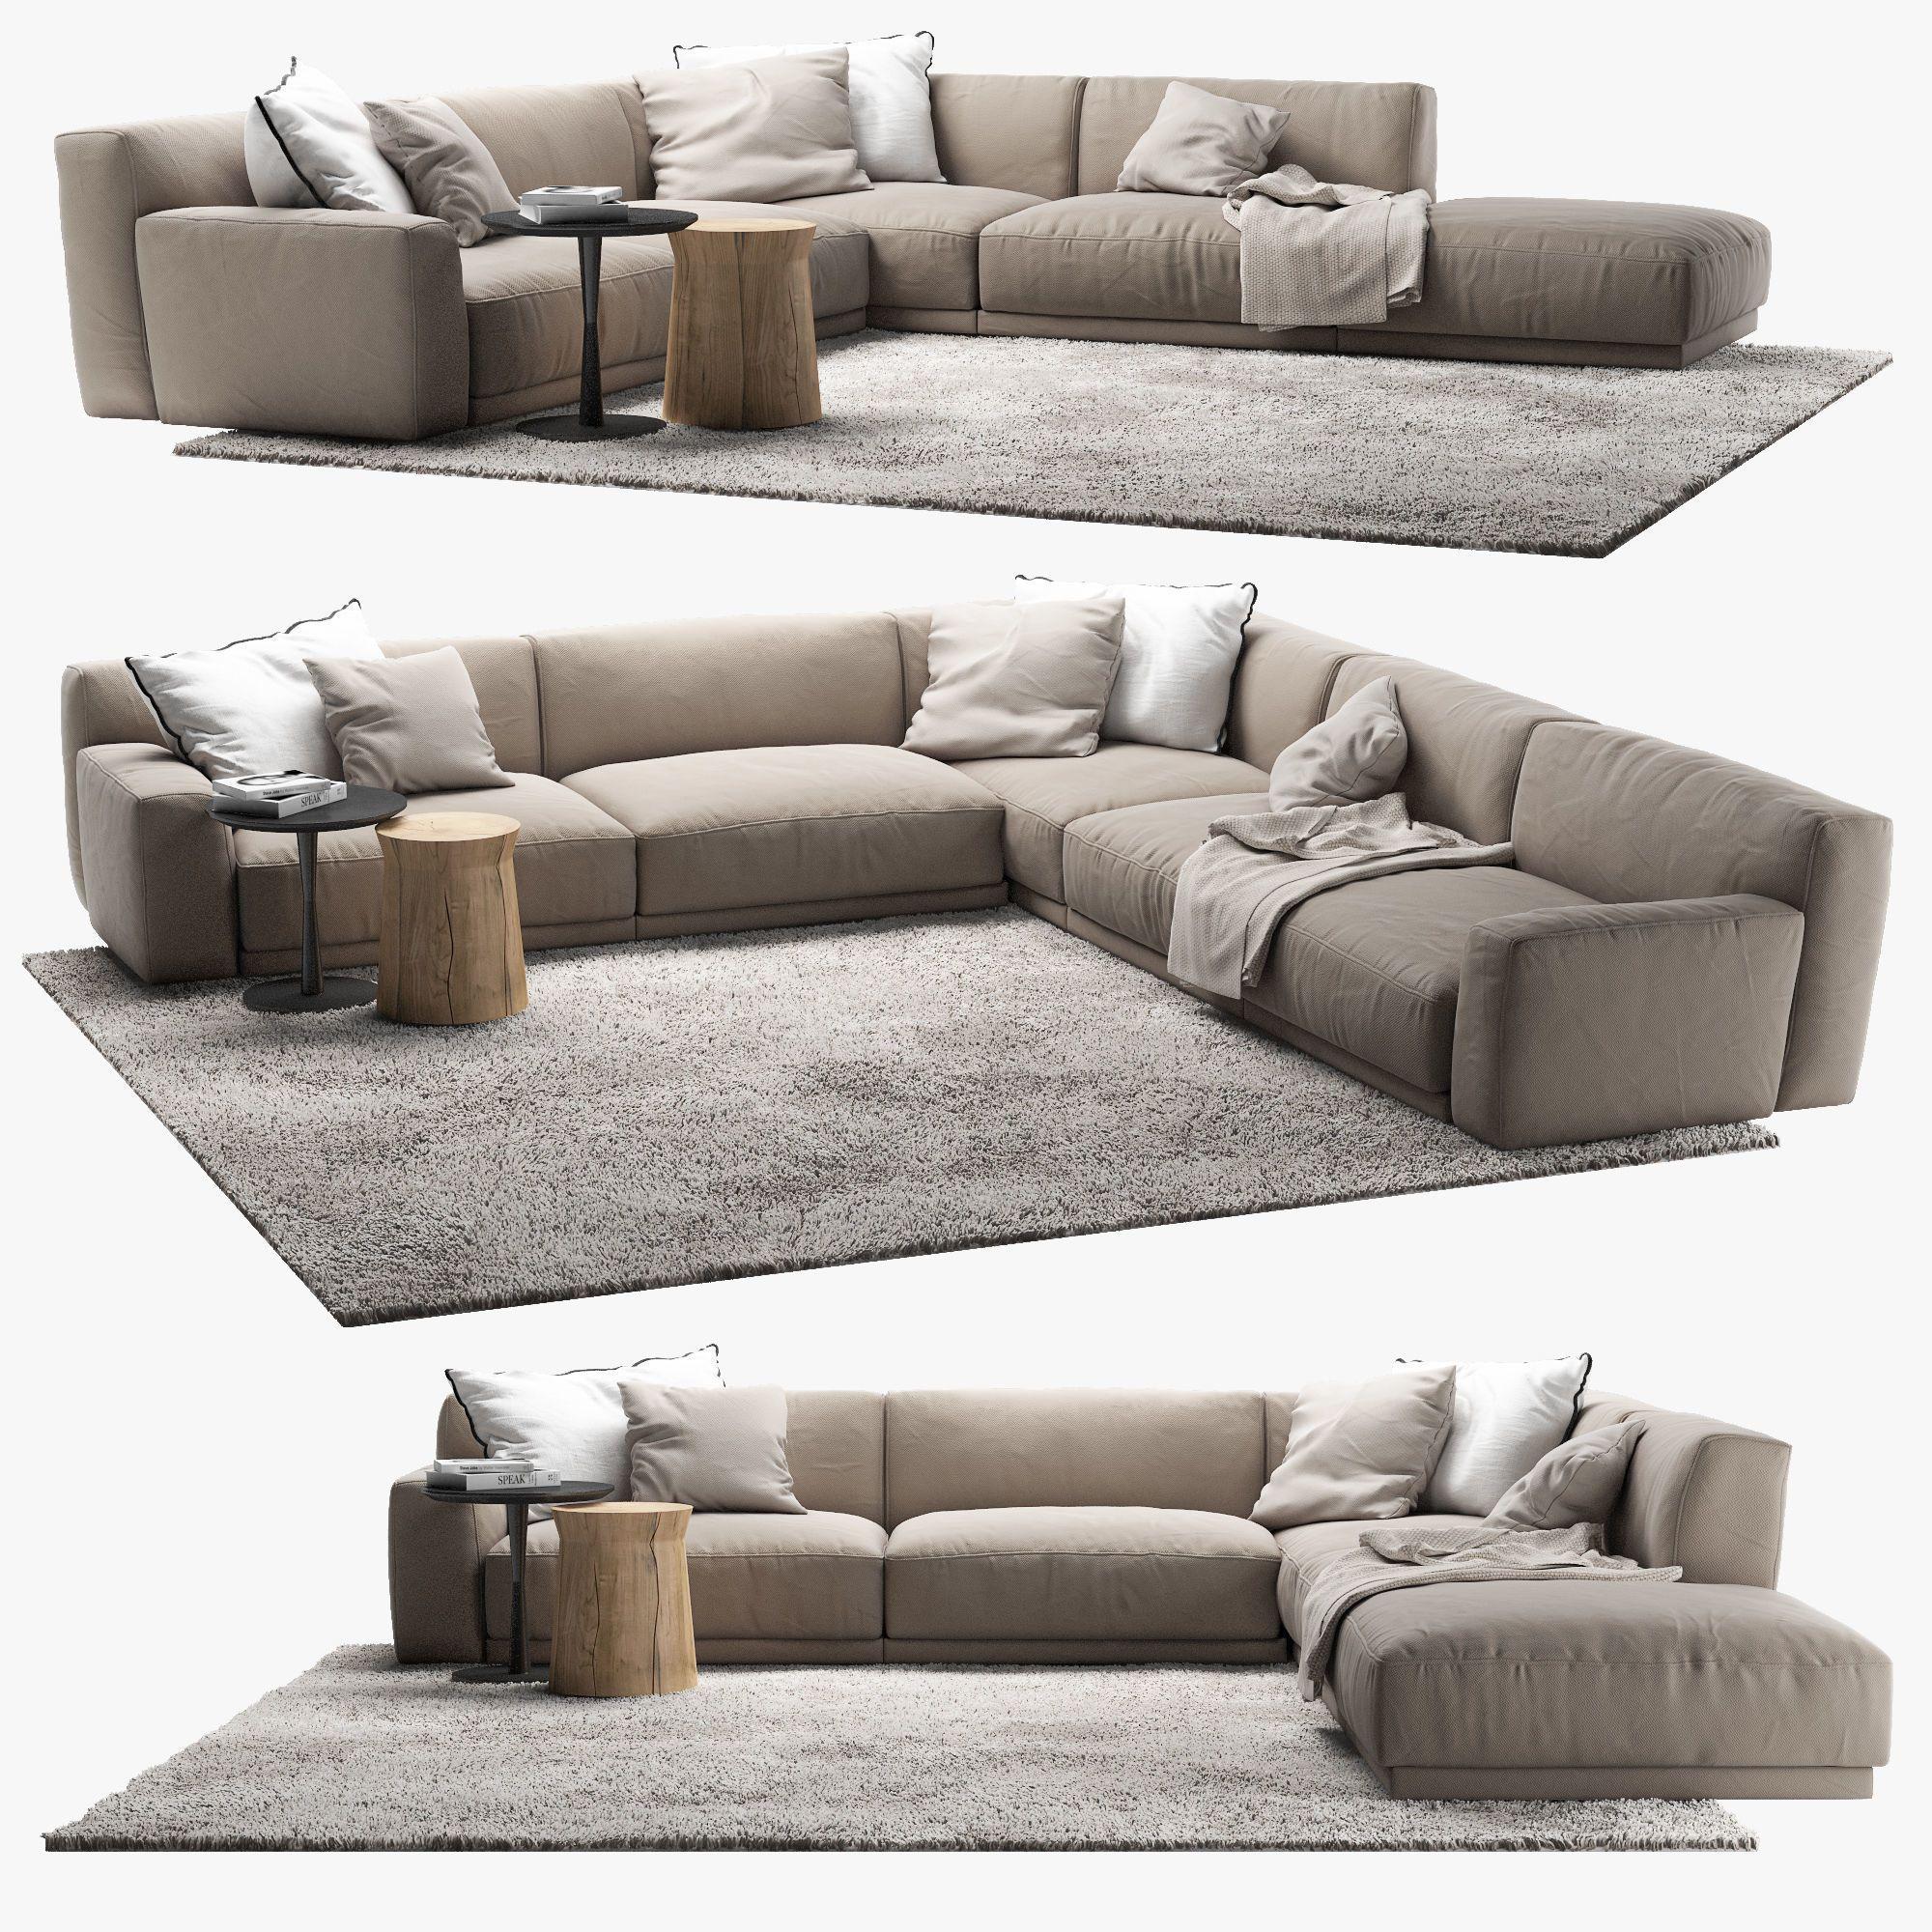 Poliform Paris Seoul Sofa 4 3d Model Sofa Set Living Room Sofa Design L Type Sofa